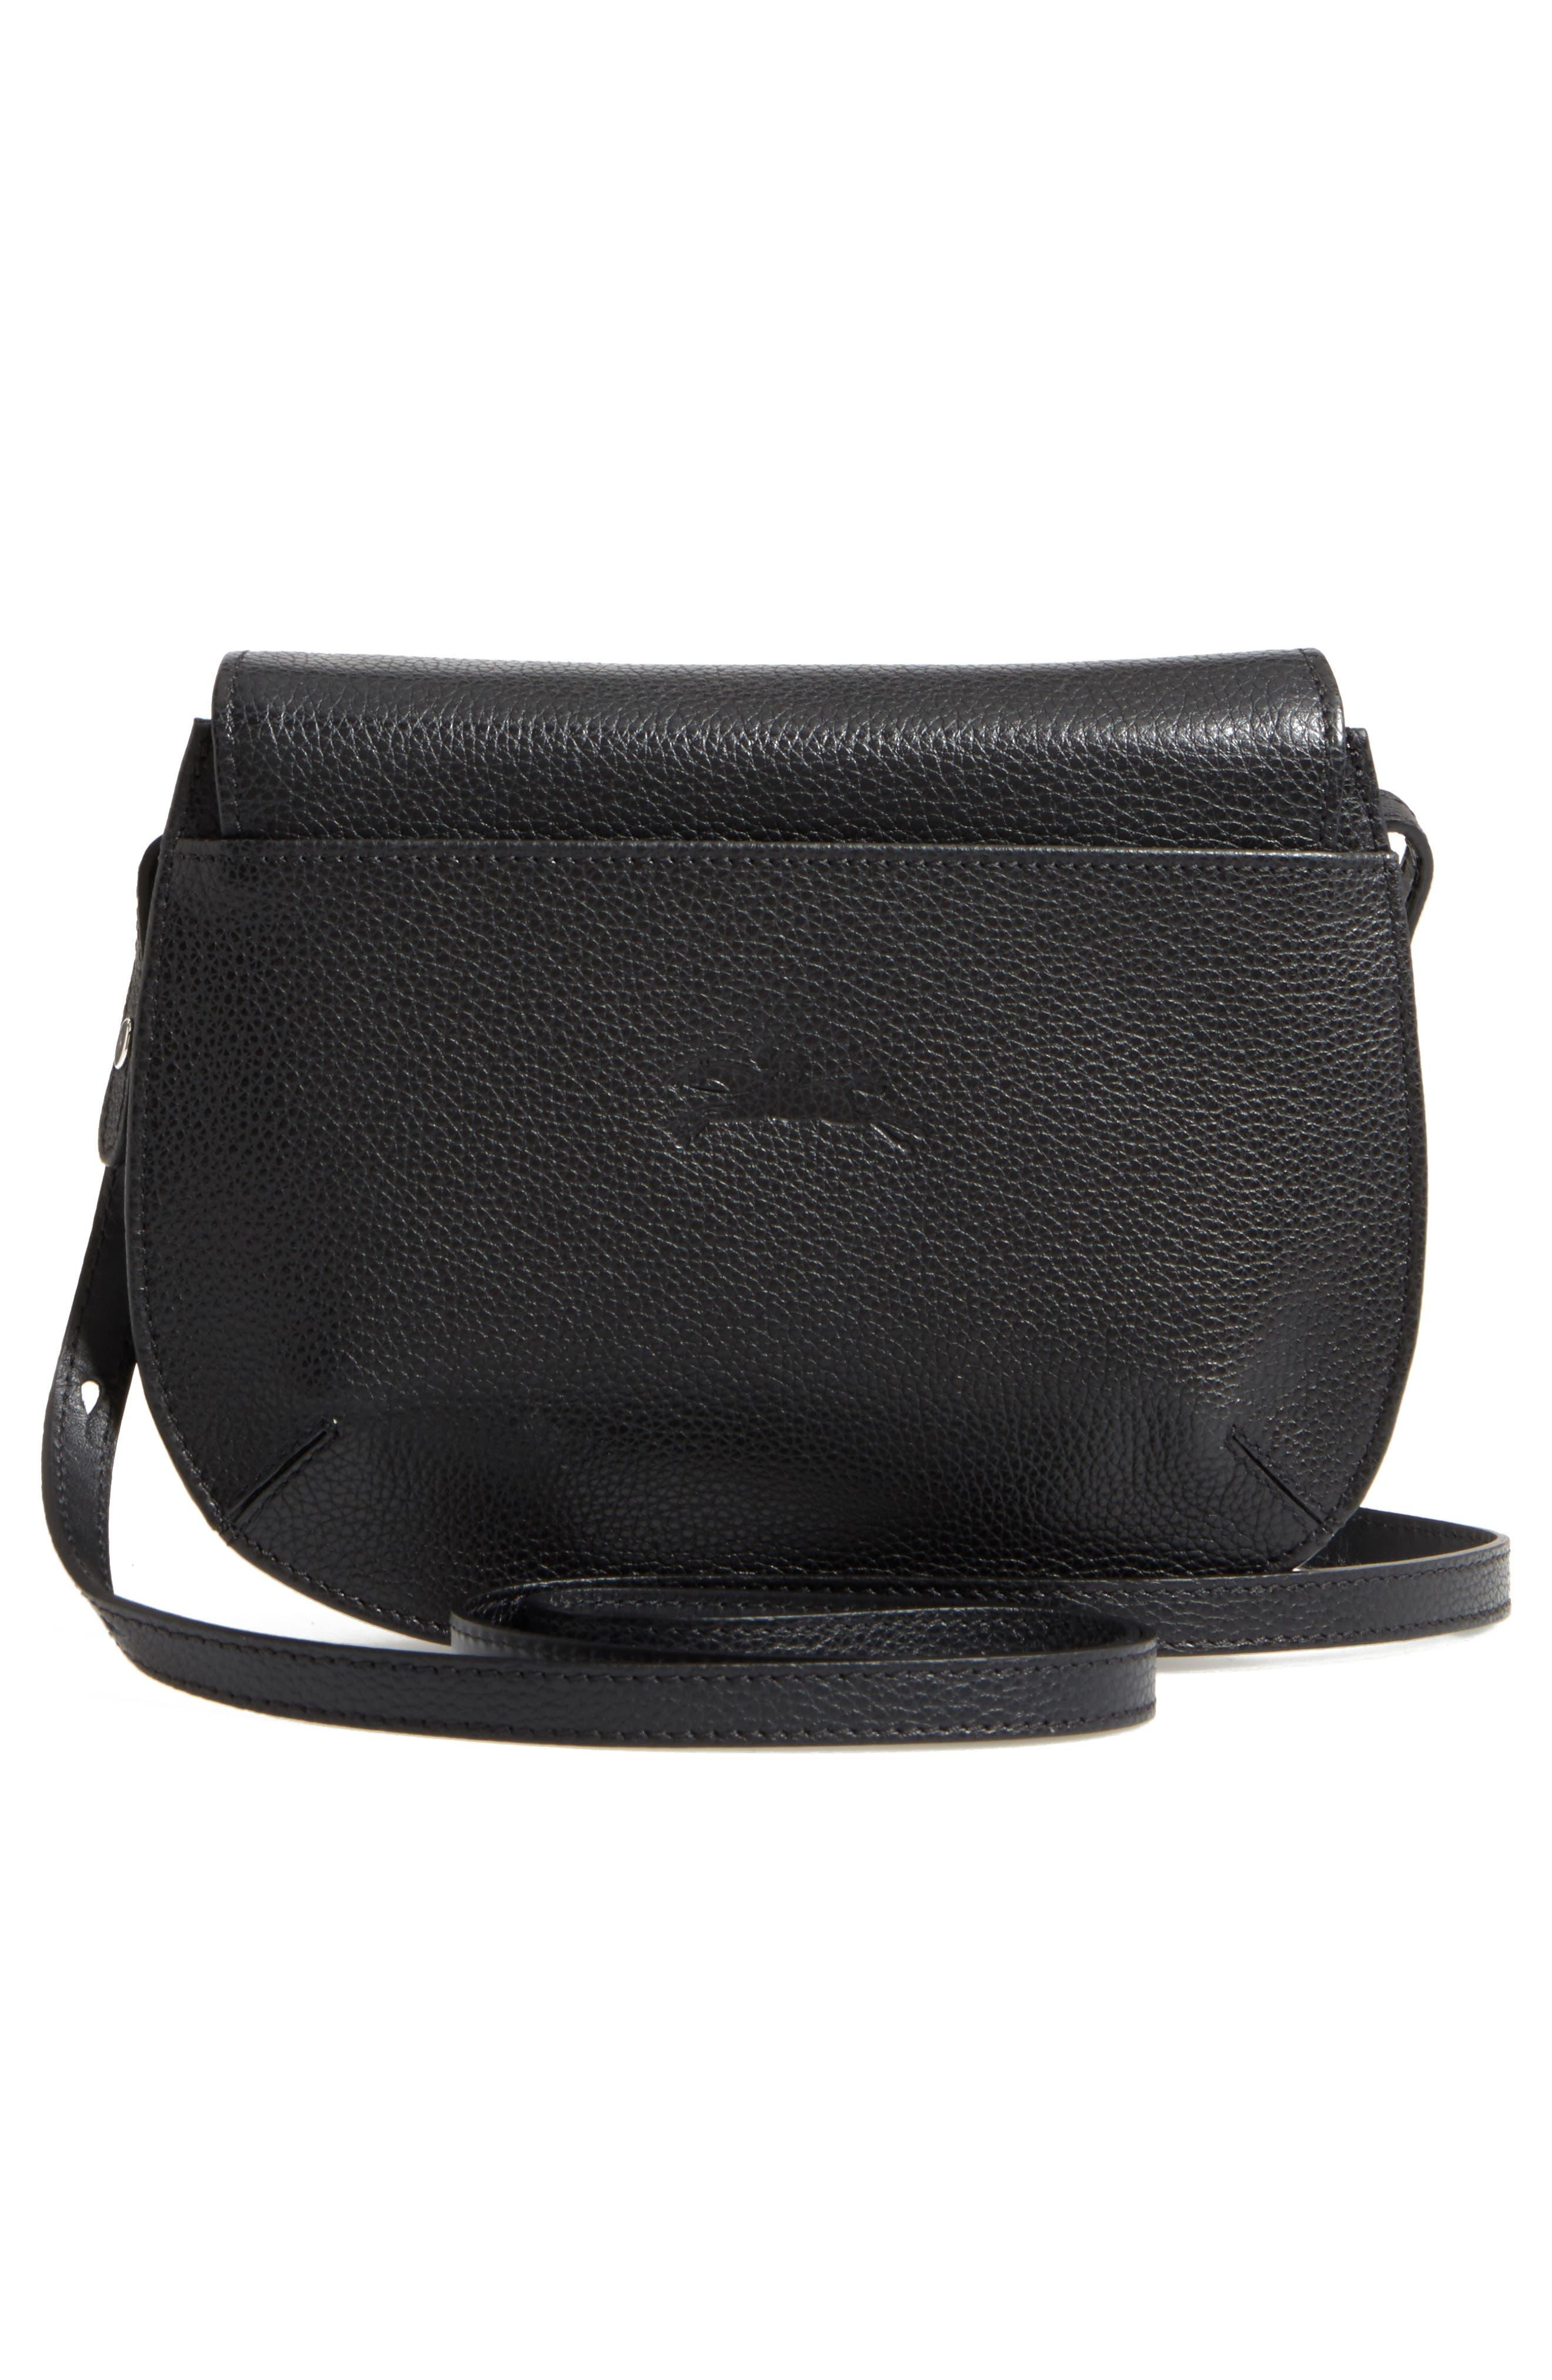 Small Le Foulonne Leather Crossbody Bag,                             Alternate thumbnail 3, color,                             BLACK